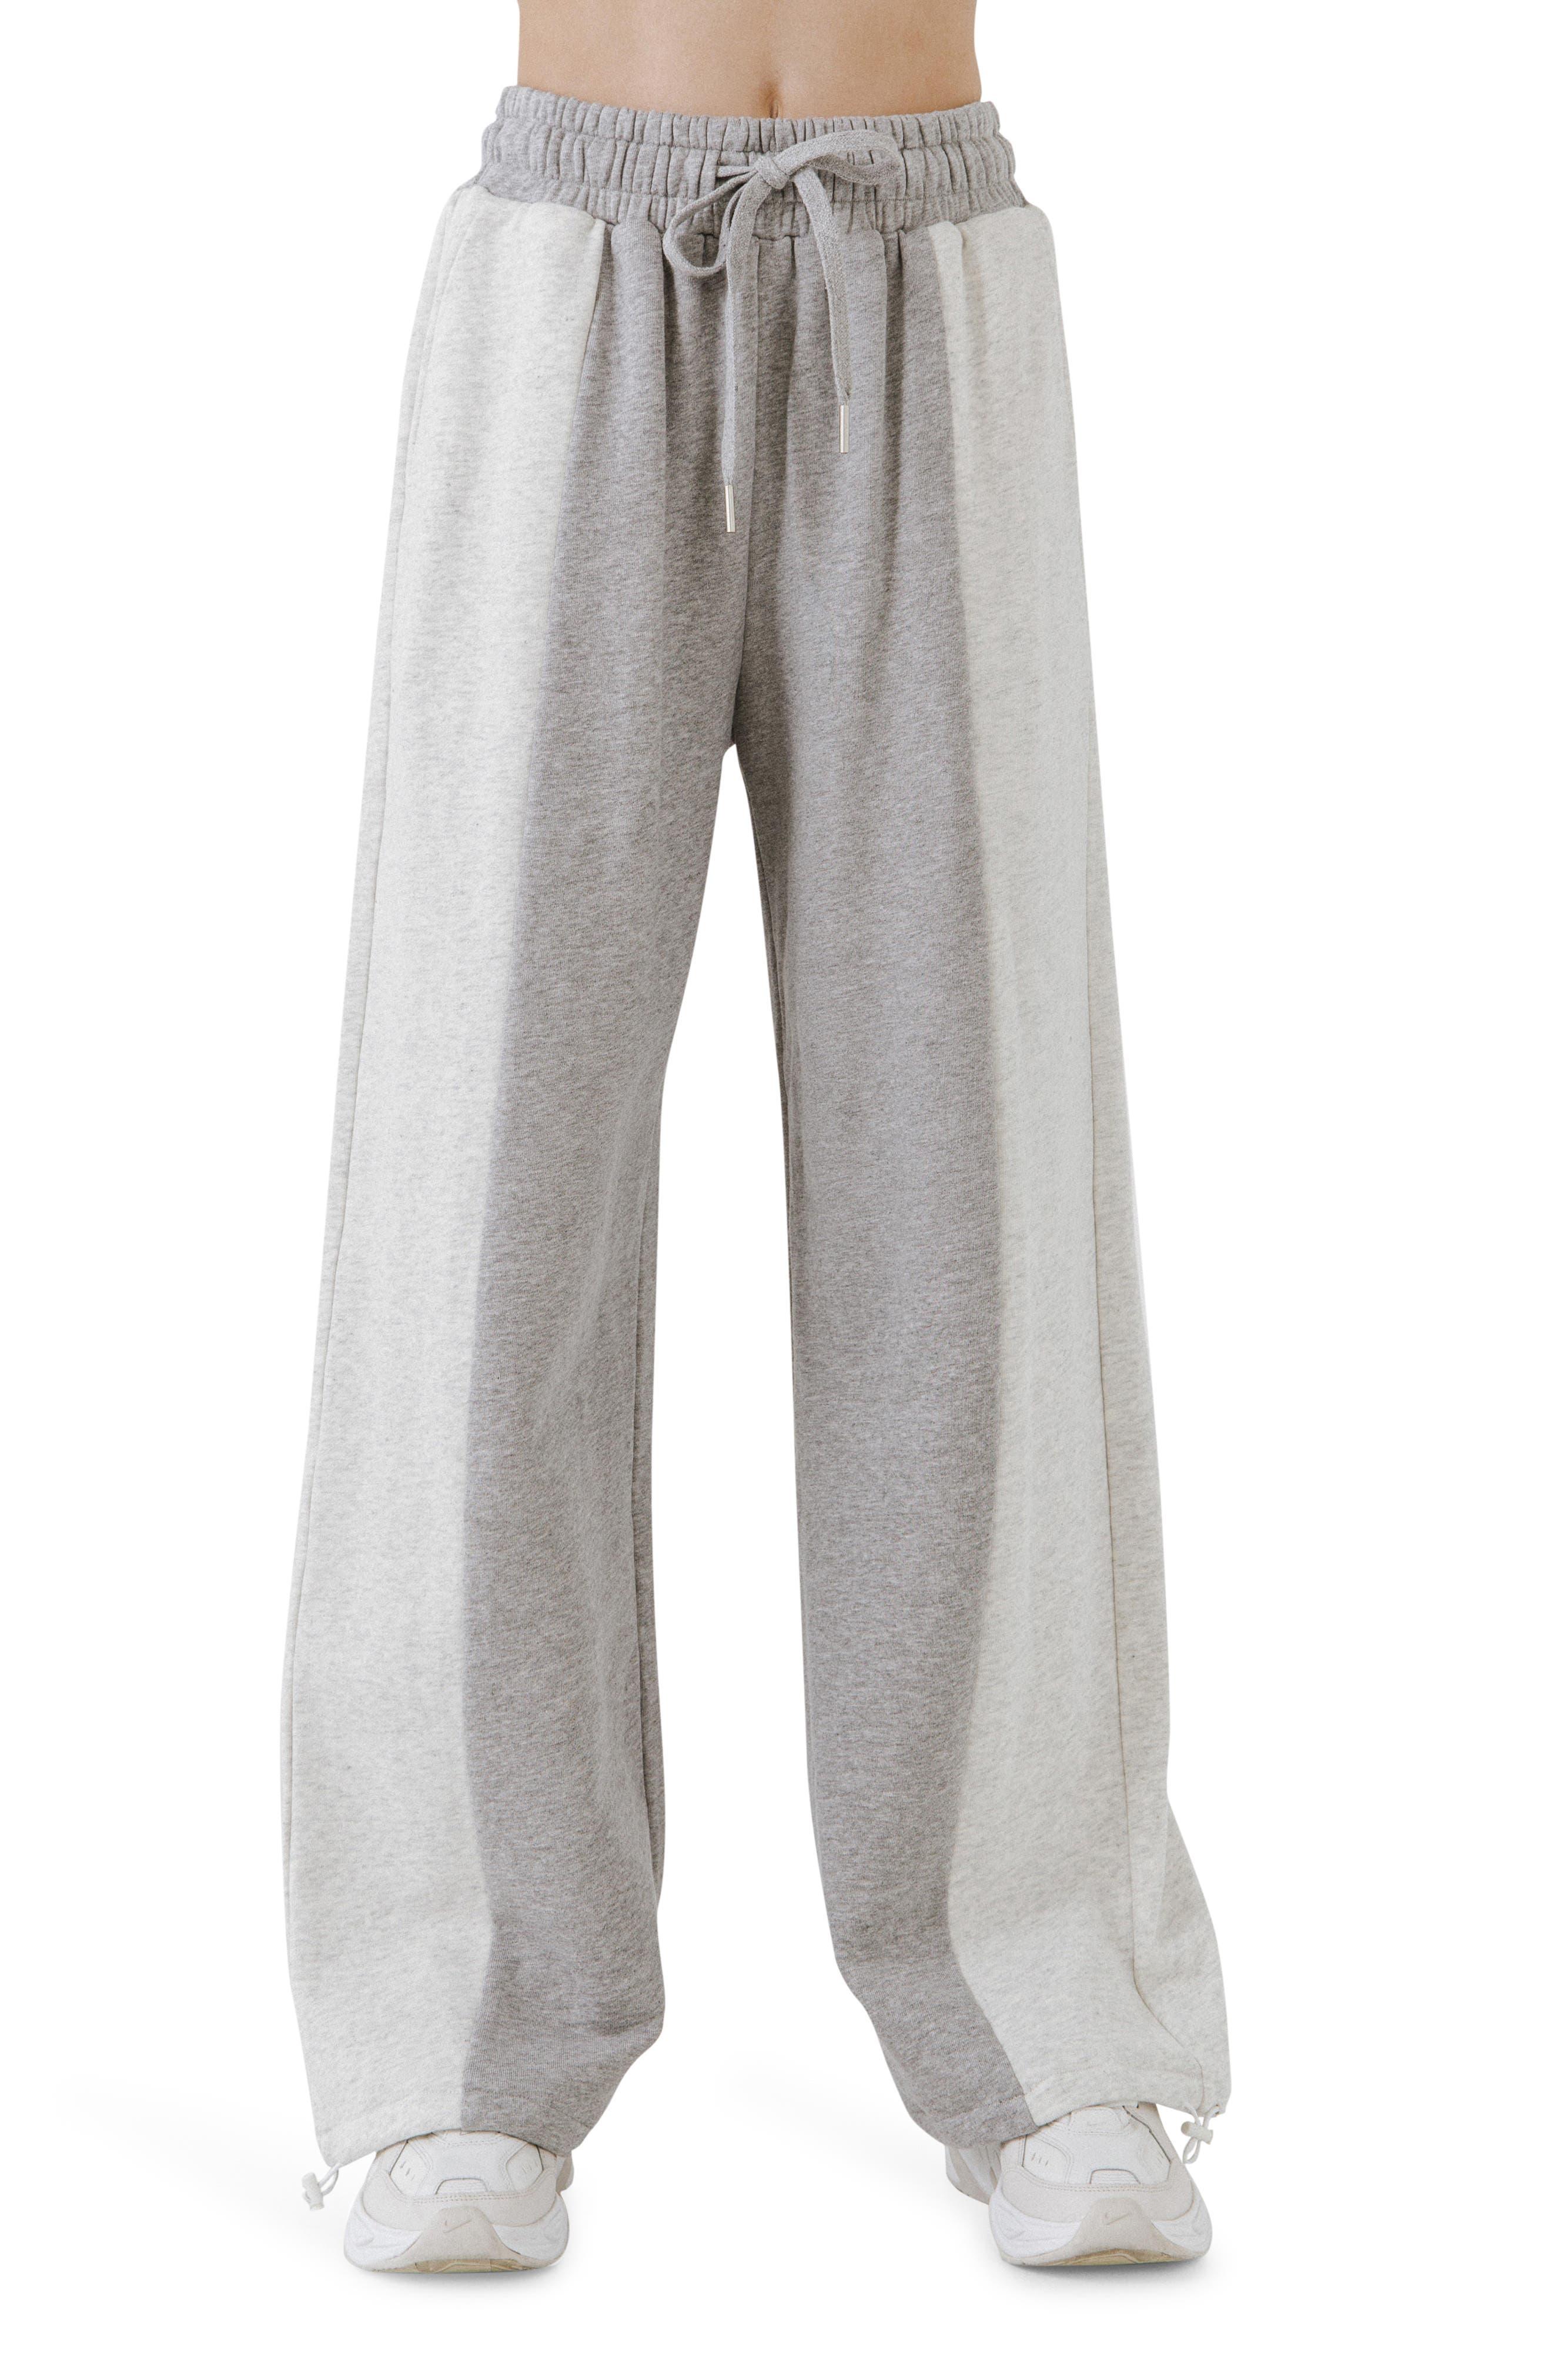 Colorblock Lounge Pants